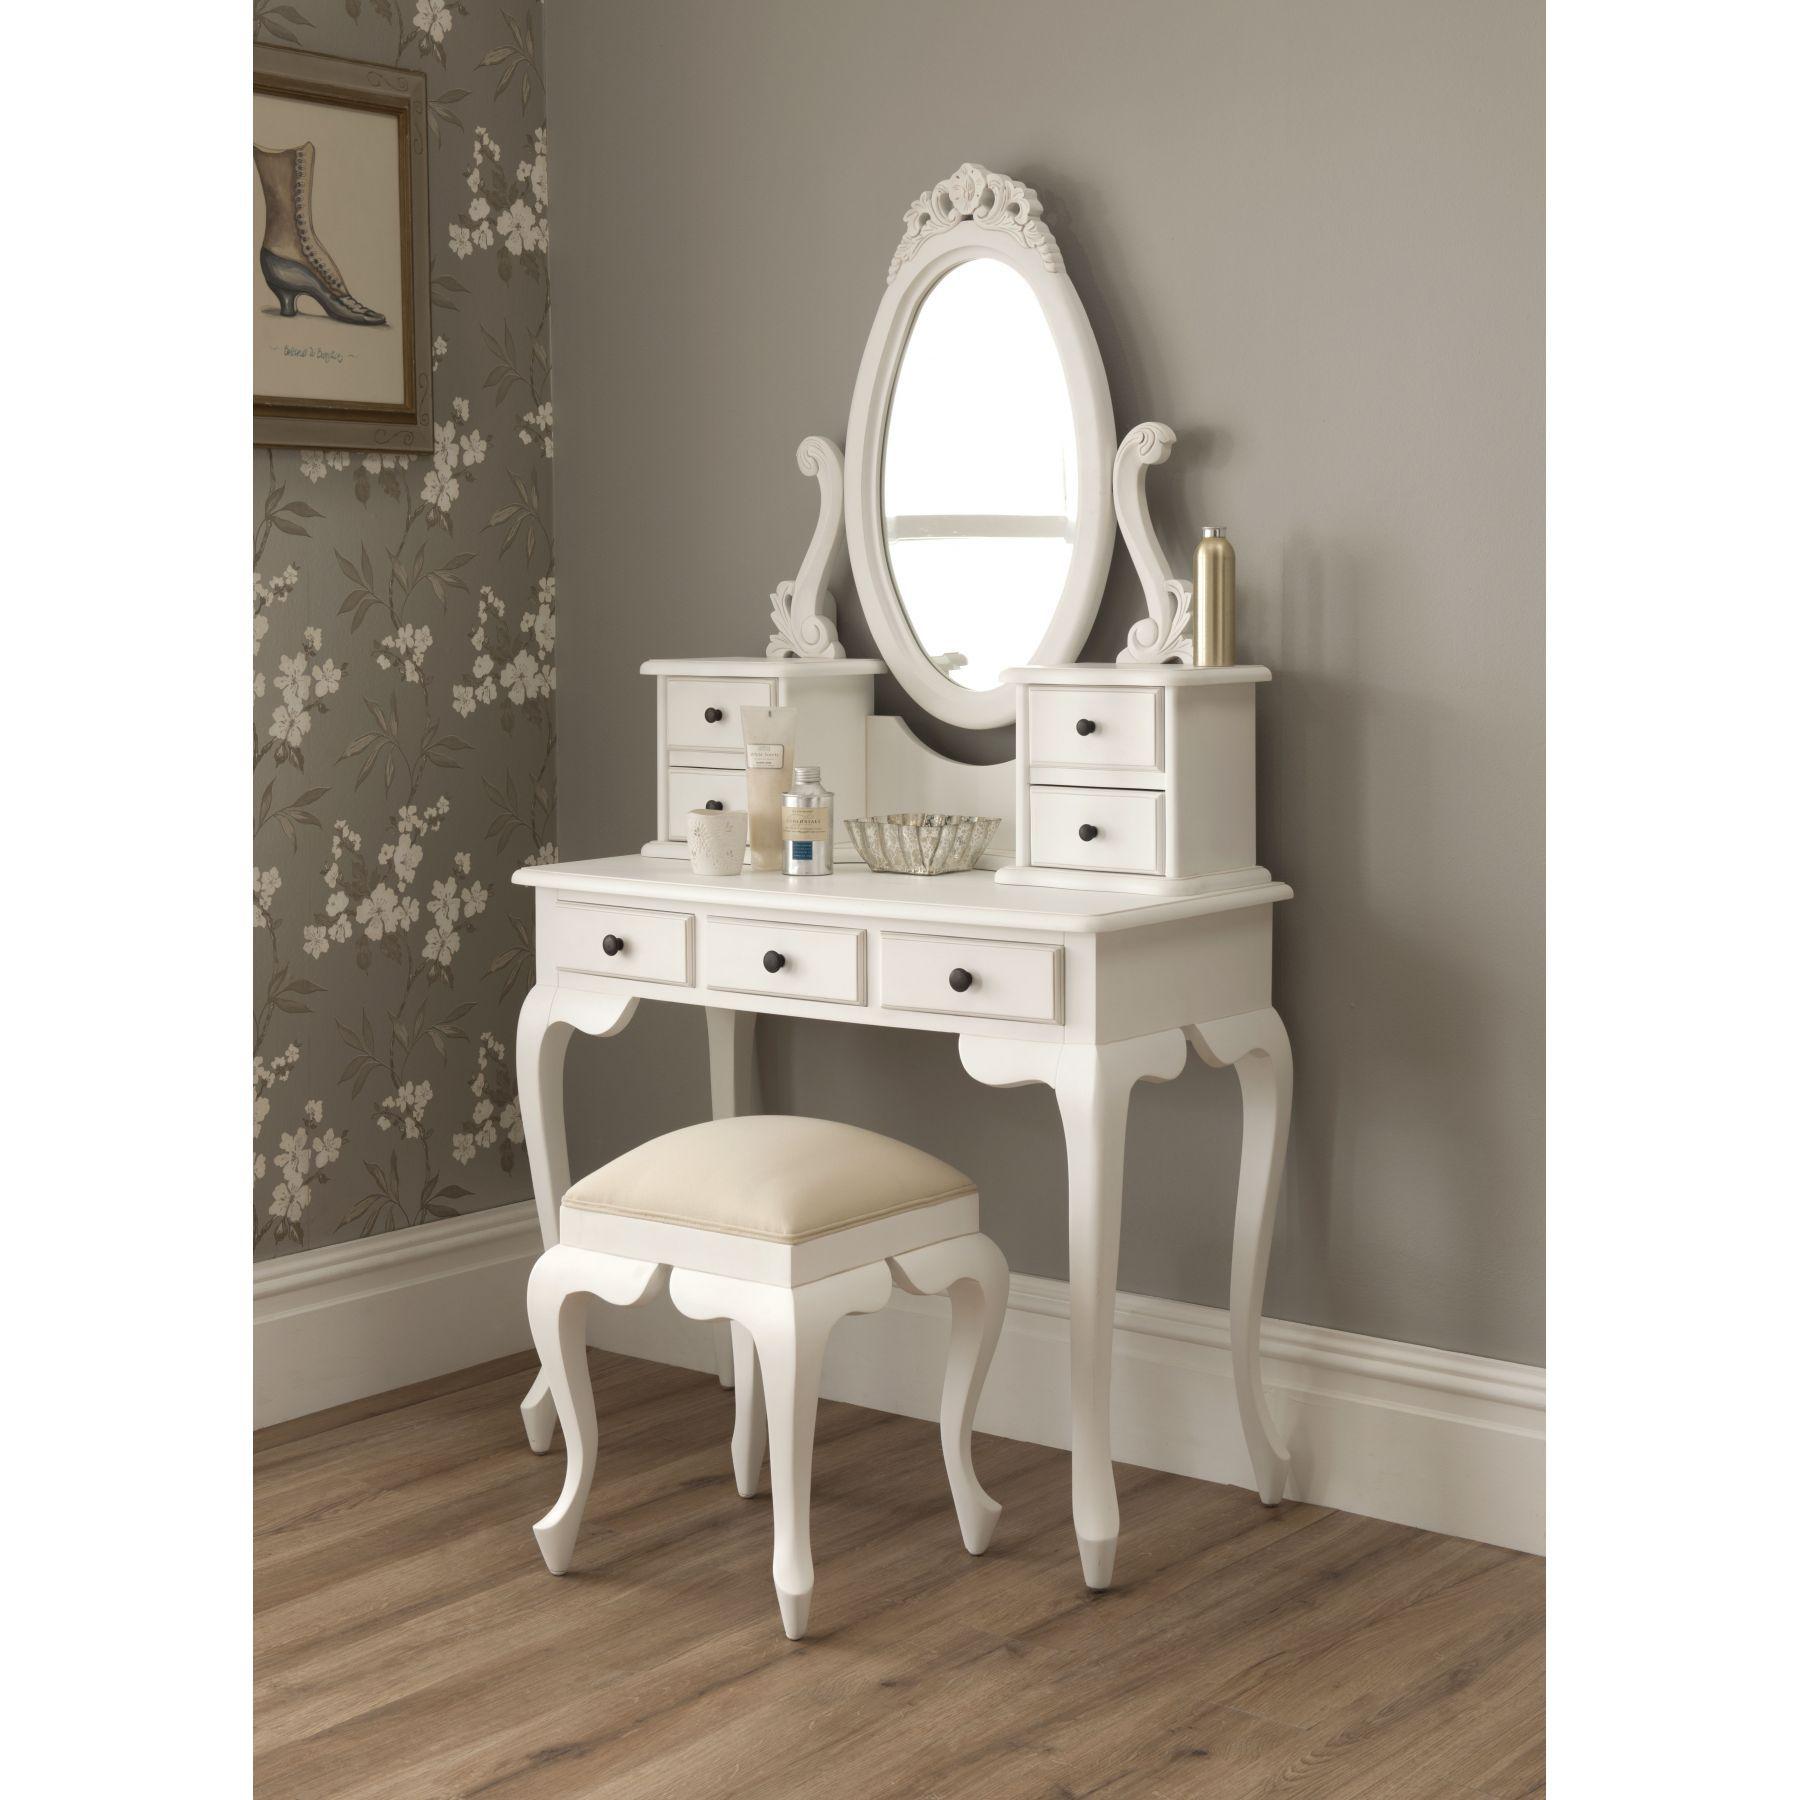 Rustic White Wooden Makeup Vanity Bedroom Enchanting